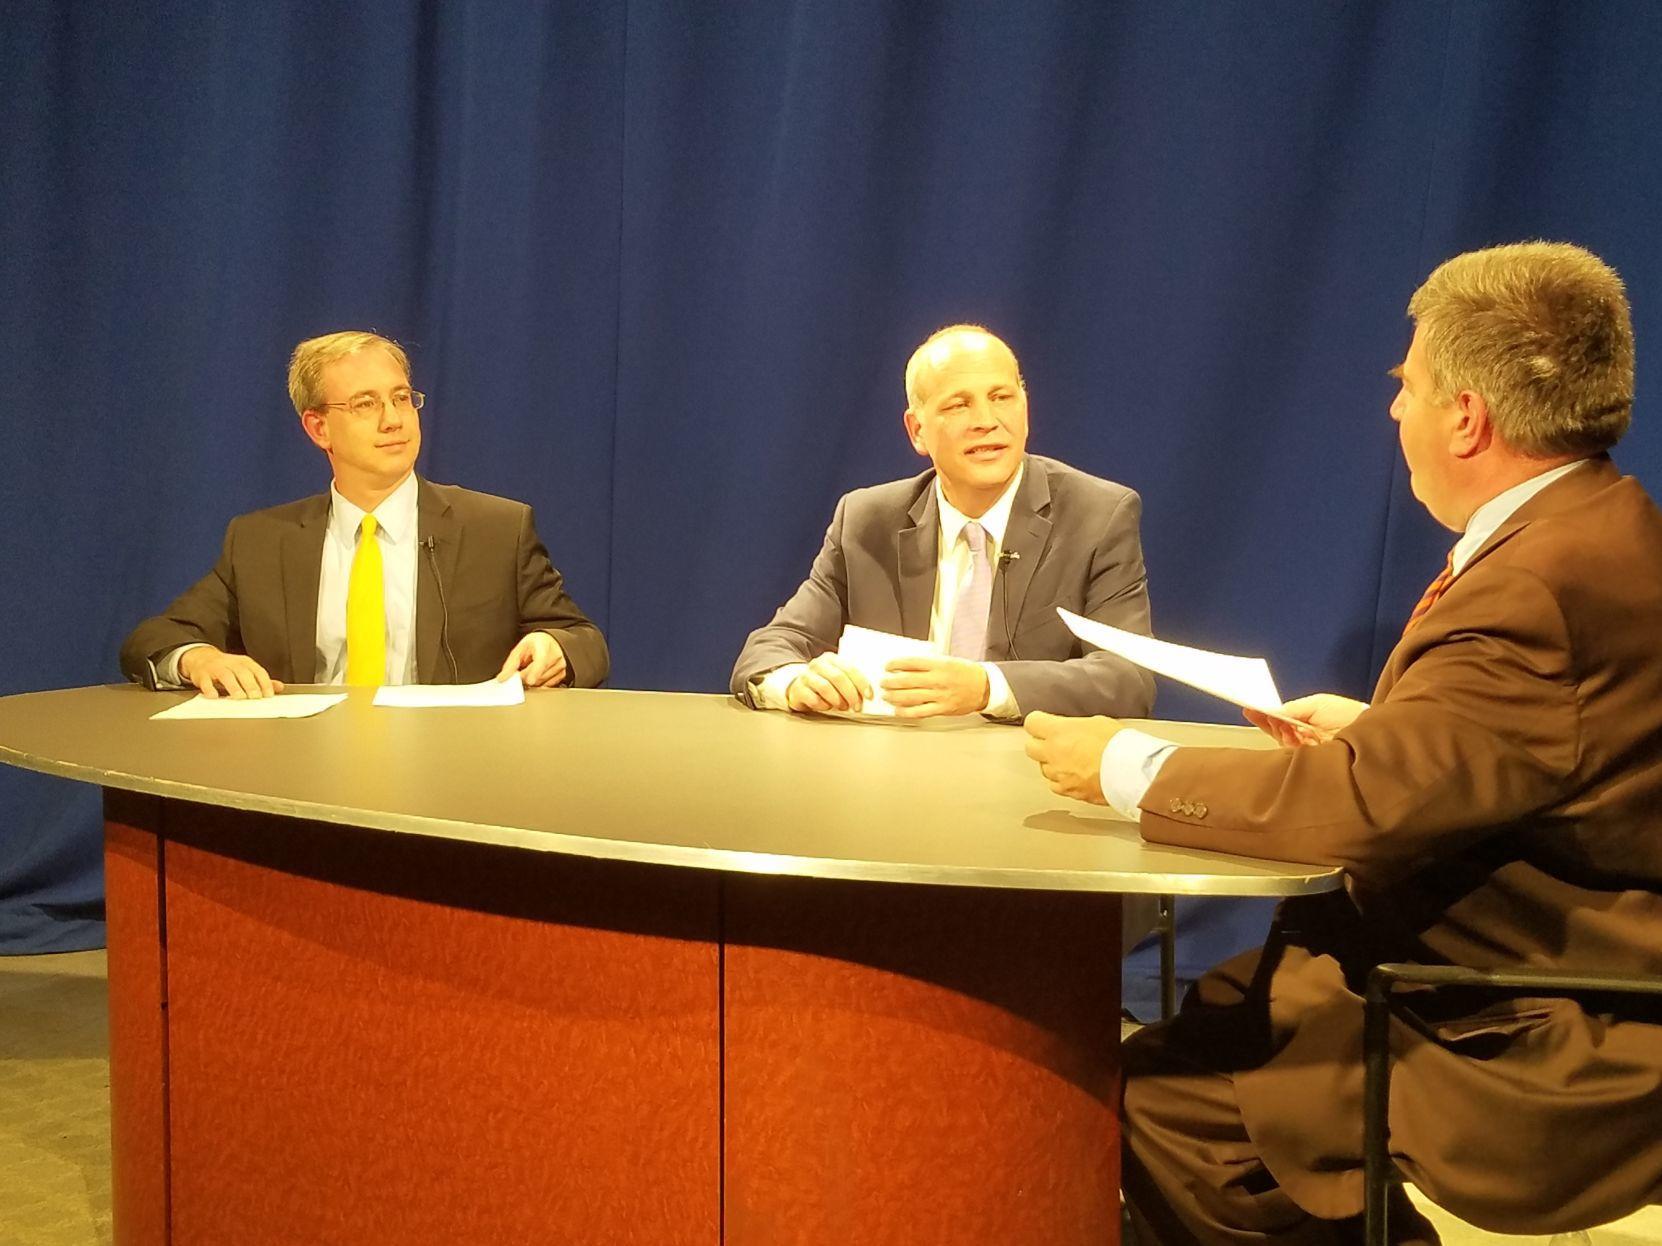 Auburn City Court Judge candidates Thurston, Buschman participate in forum